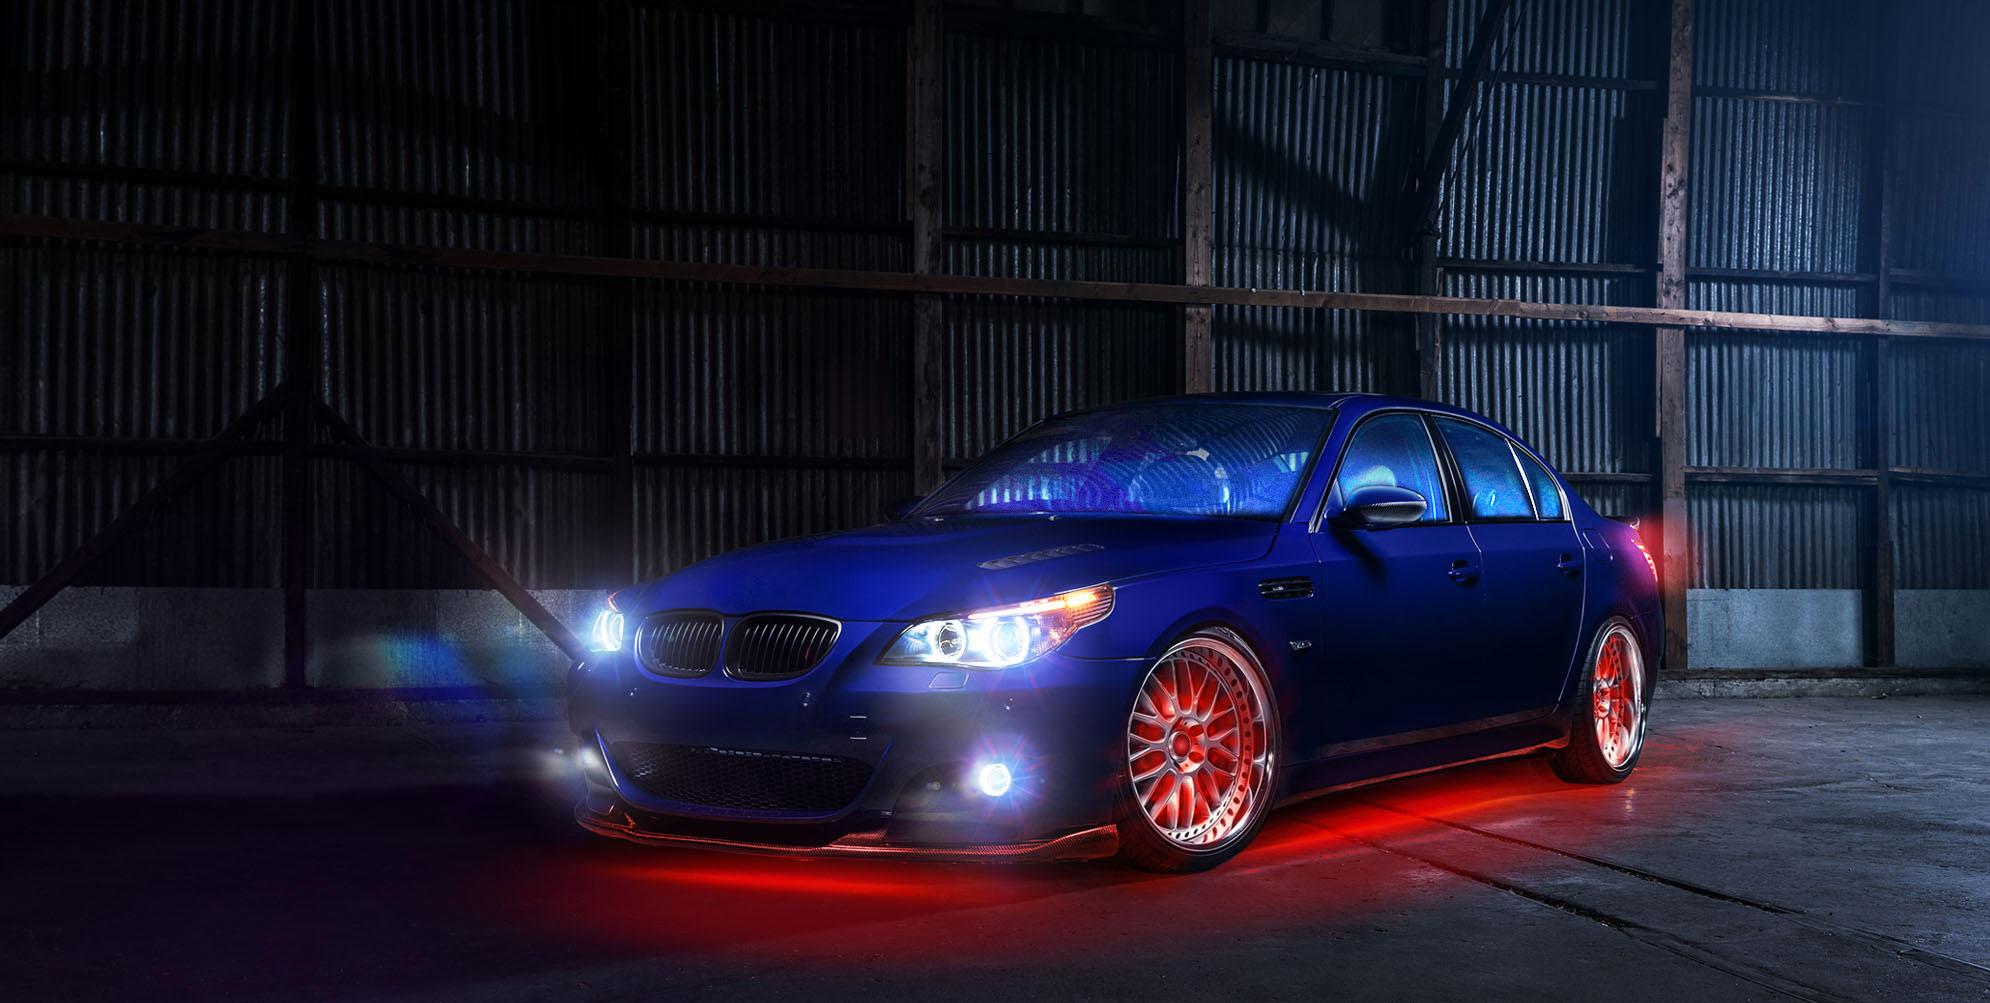 Car Leds: LED & HID Lighting For Cars, Trucks & Motorcycles